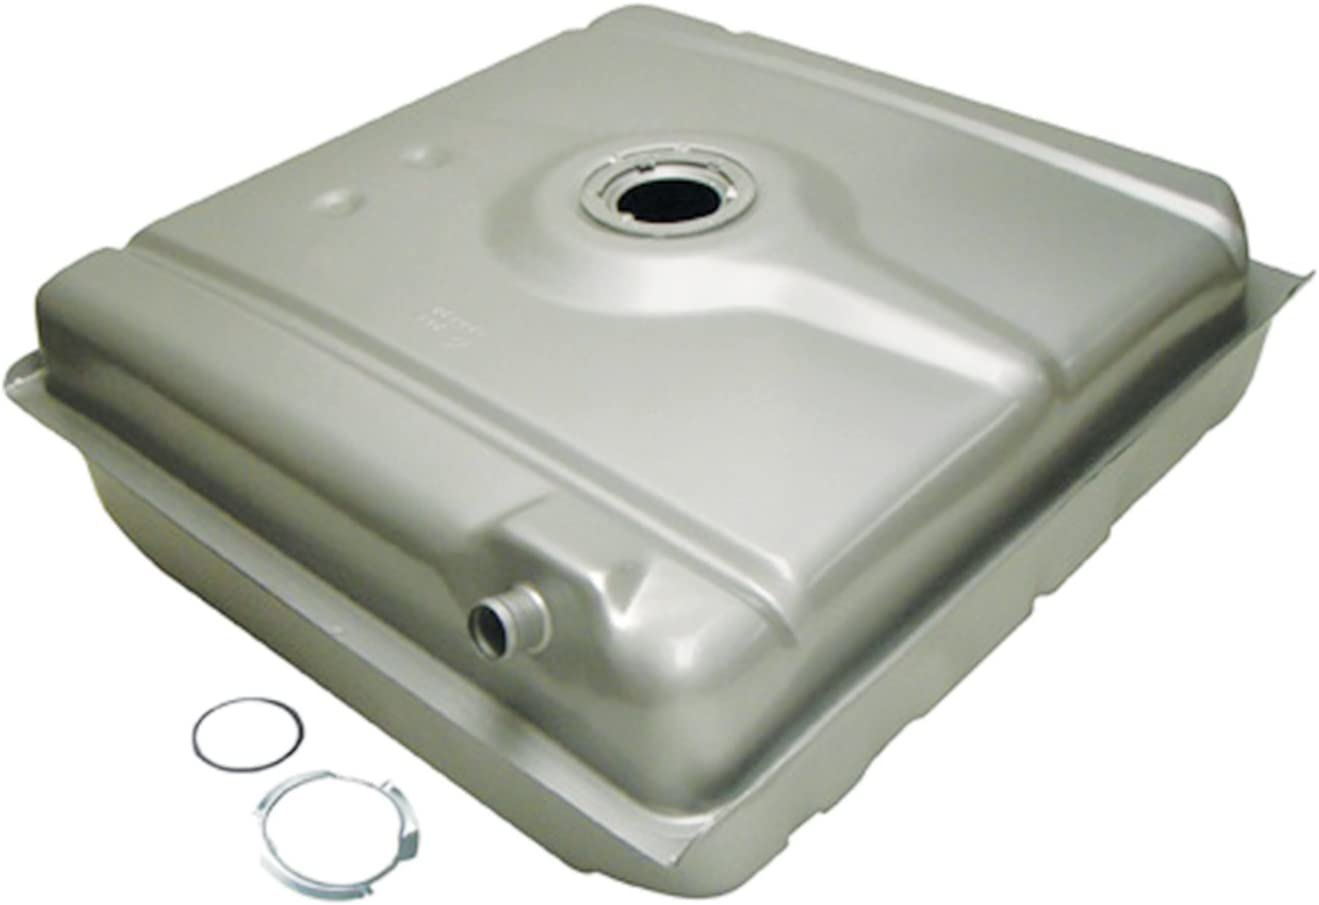 Biscayne Gas Tank Fuel Tank IMPALA BOBS 1961-1964 Chevy Impala Bel Air